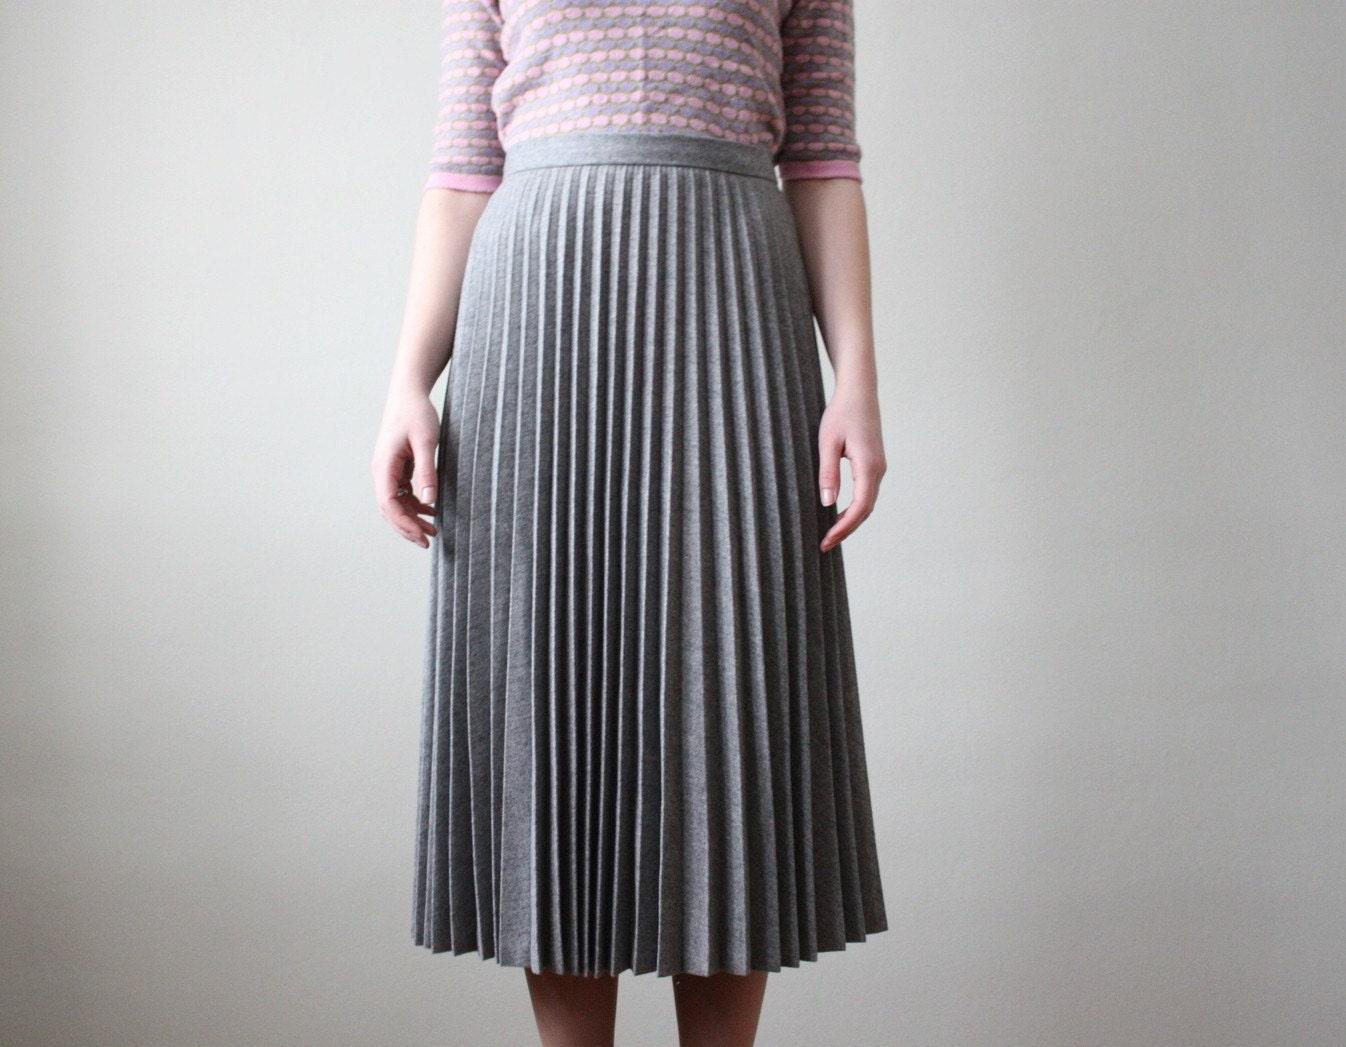 1970 s slate gray accordion pleated skirt